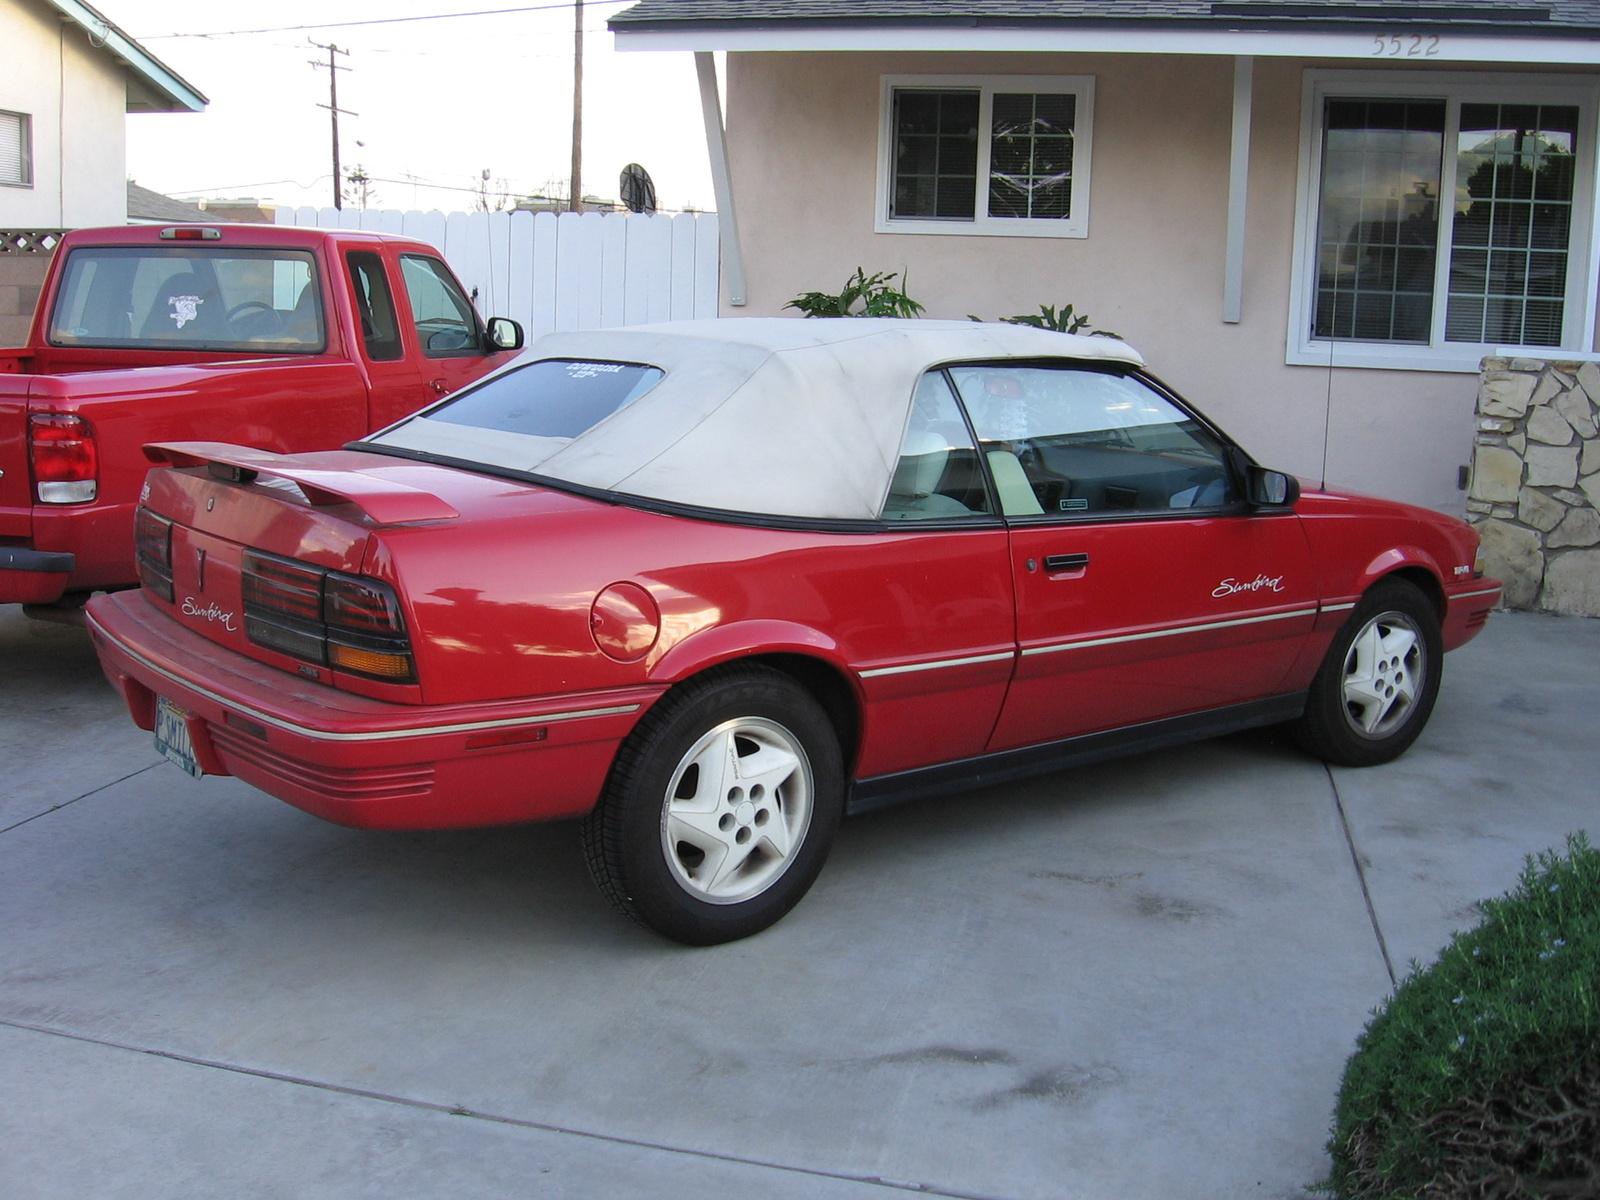 1992 Pontiac Sunbird 2 Dr SE Convertible - Pictures - 1992 Pontiac ...